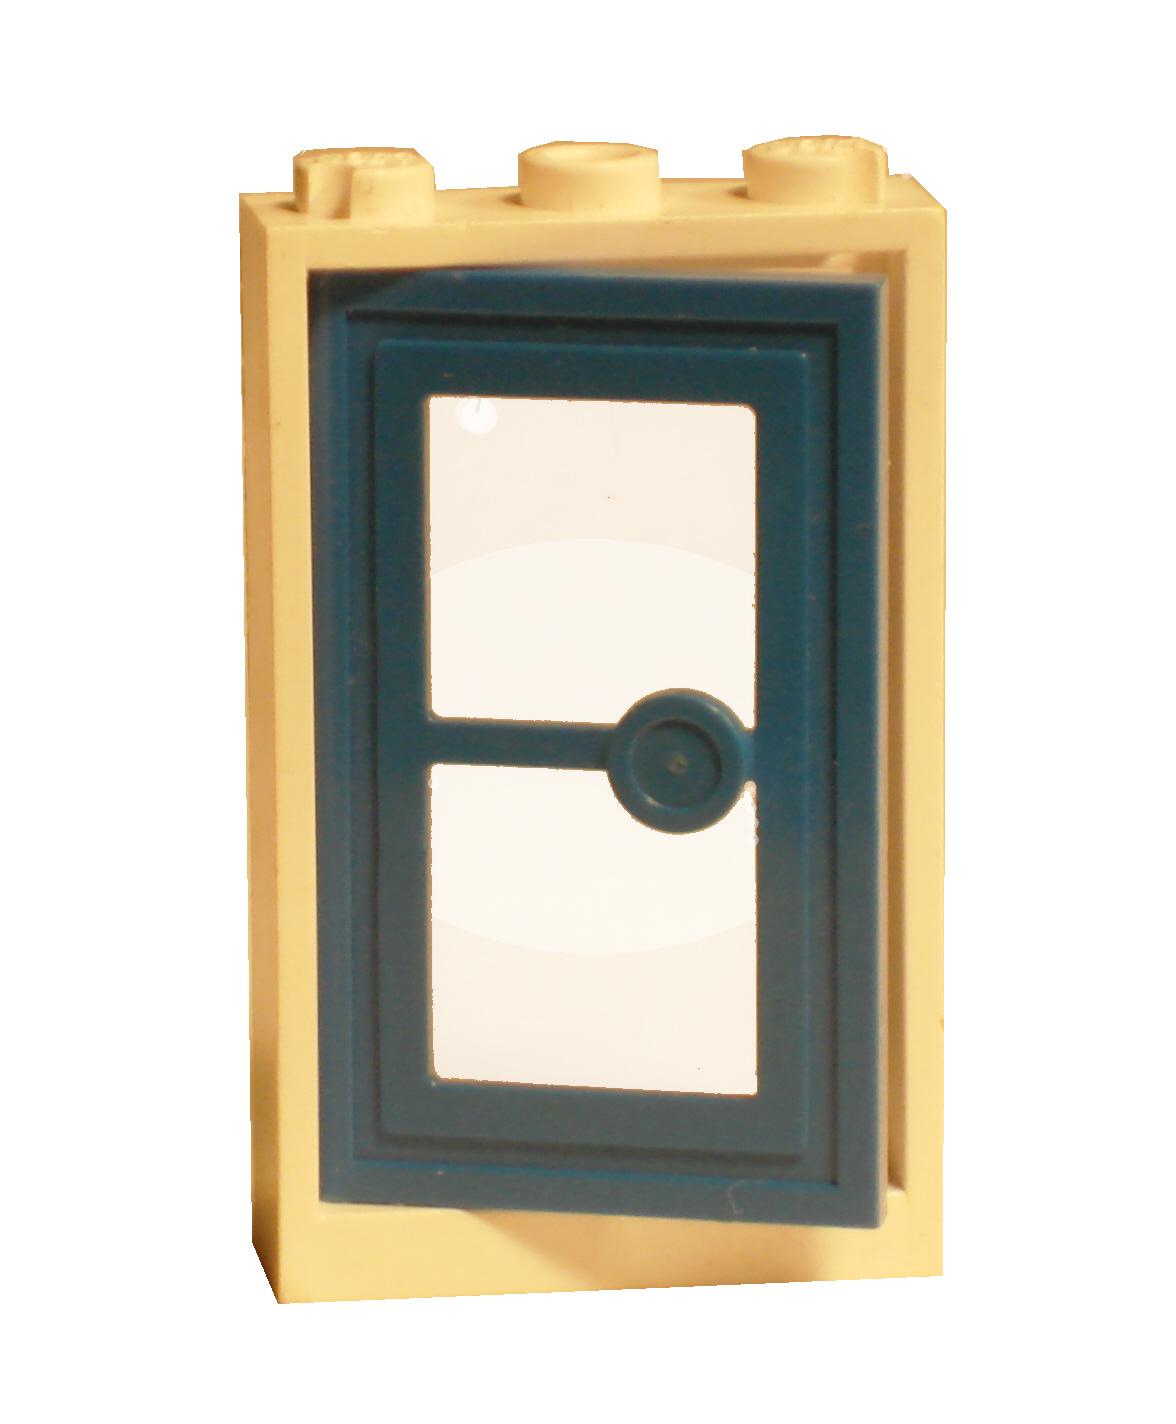 FileLego Doors.jpg  sc 1 st  Wikimedia Commons & File:Lego Doors.jpg - Wikimedia Commons